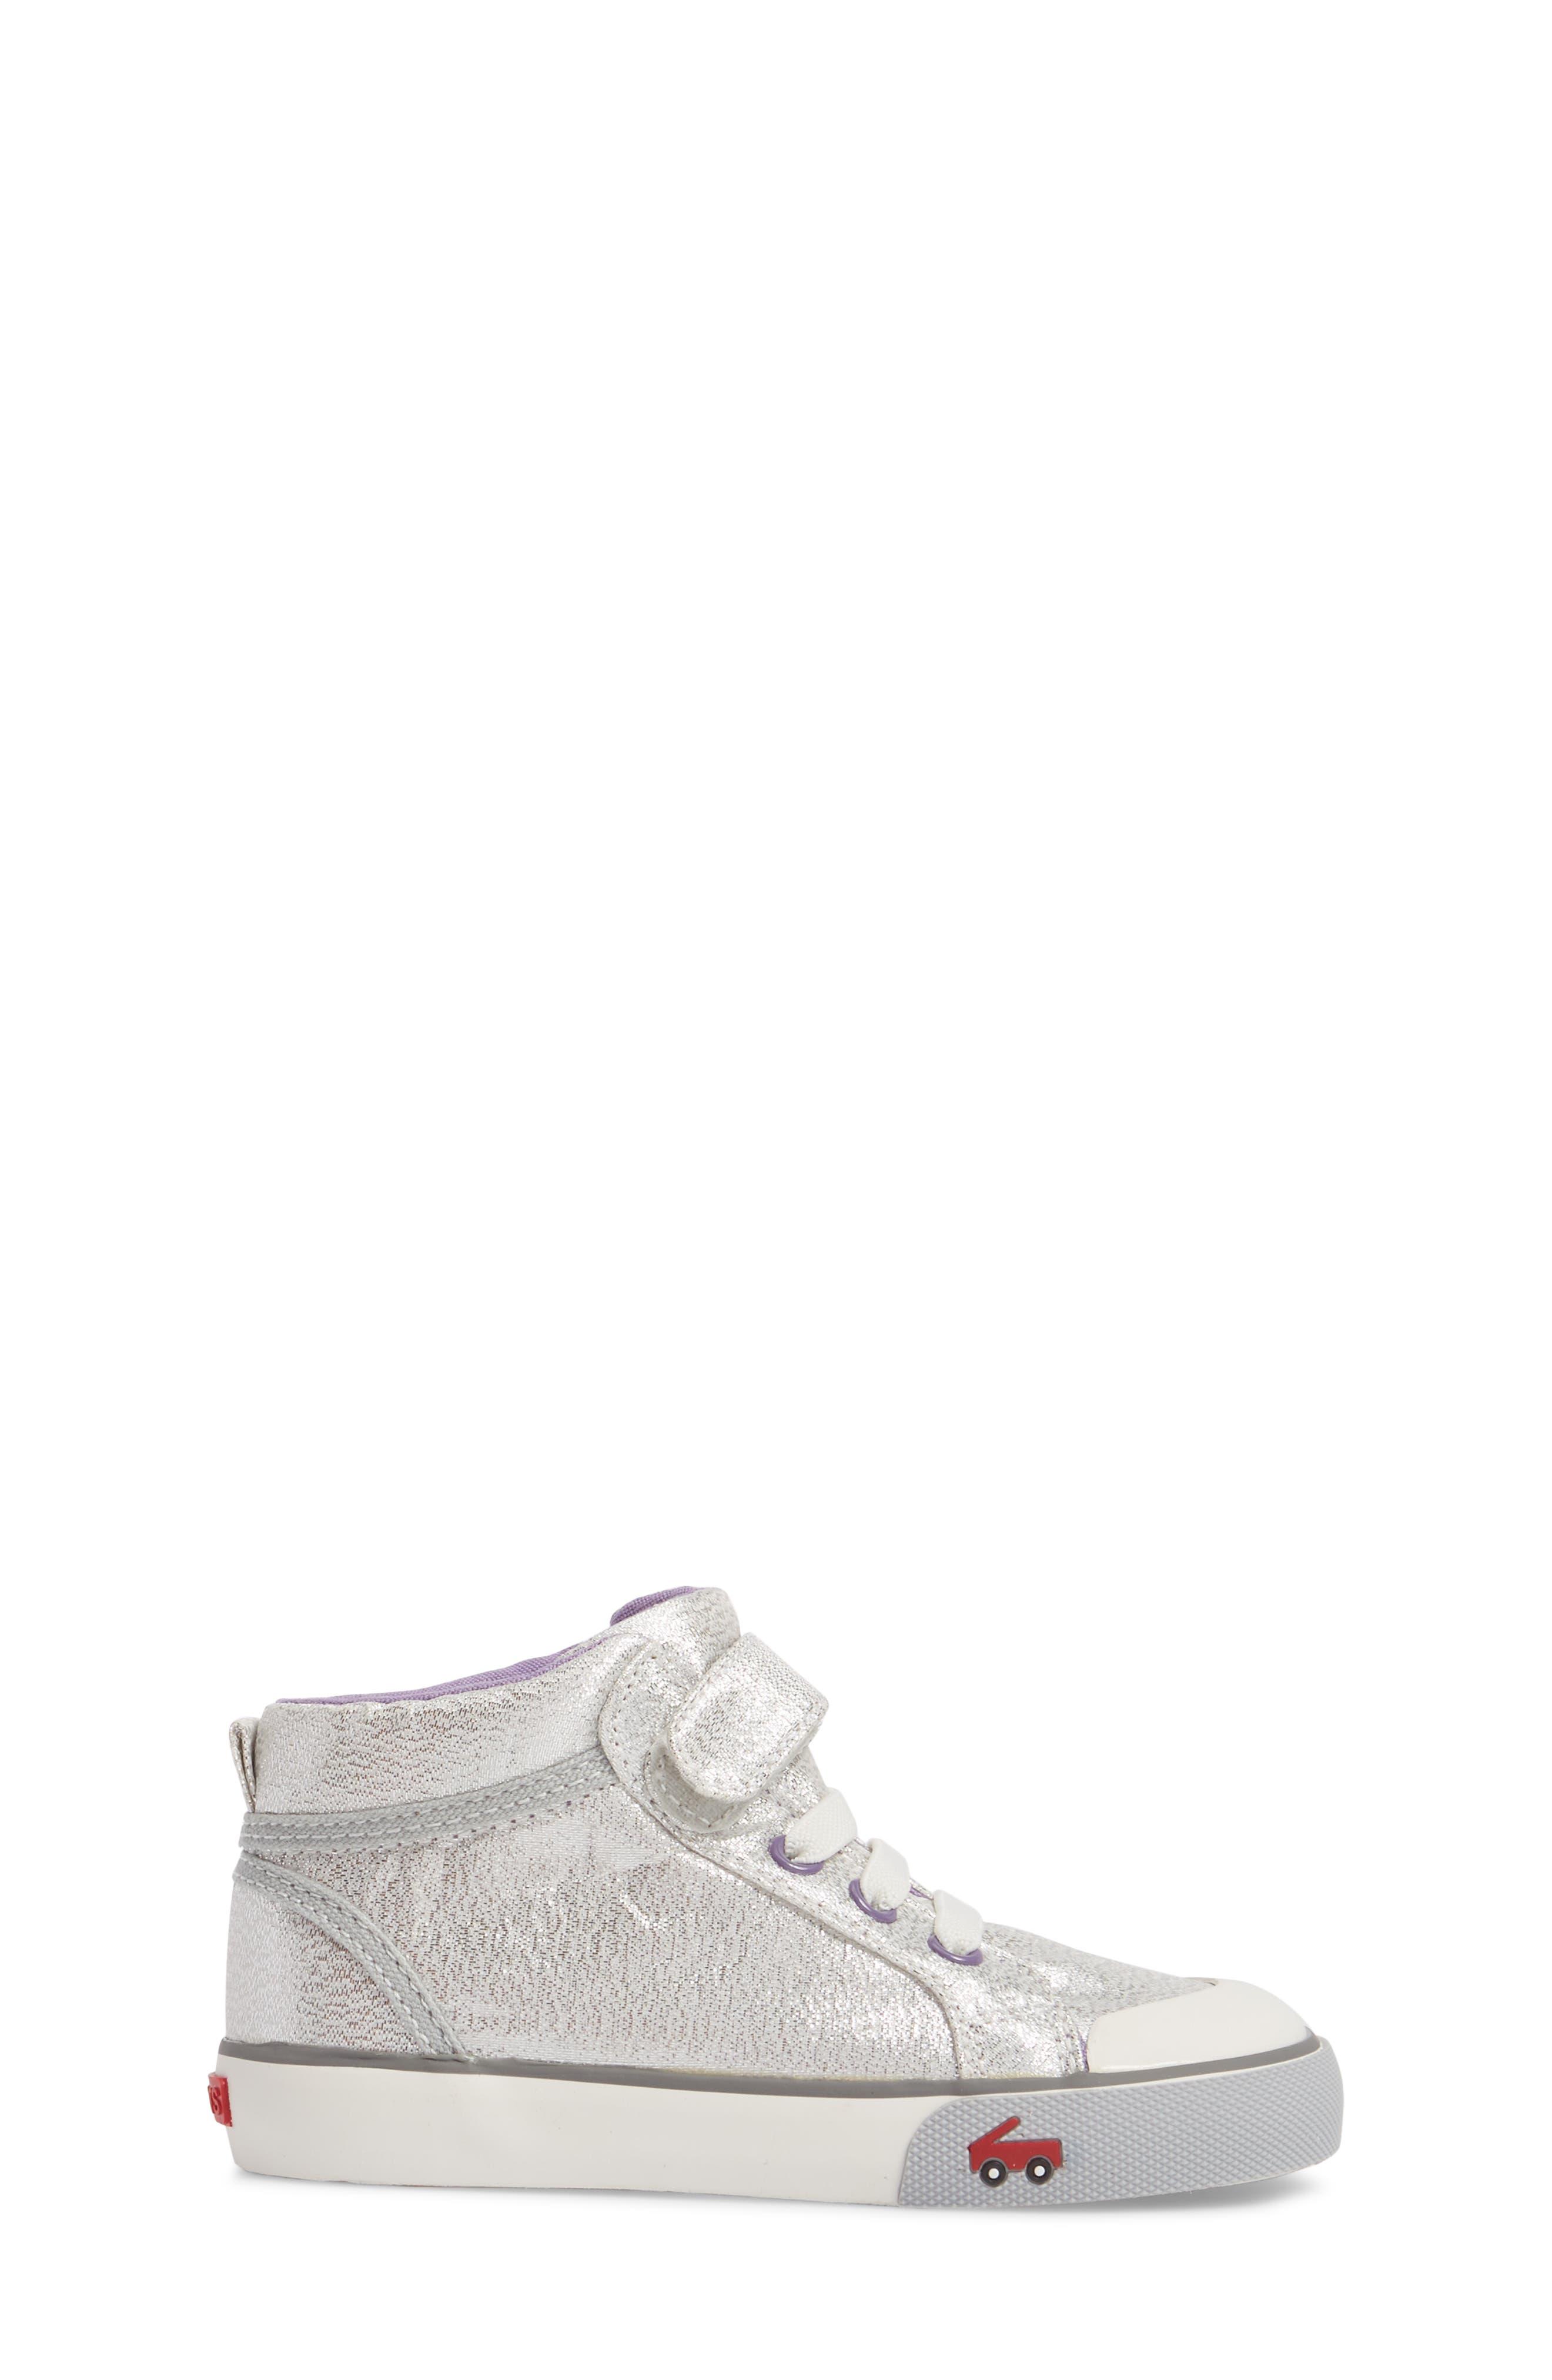 Peyton Metallic Mid Top Sneaker,                             Alternate thumbnail 3, color,                             SILVER GLITTER